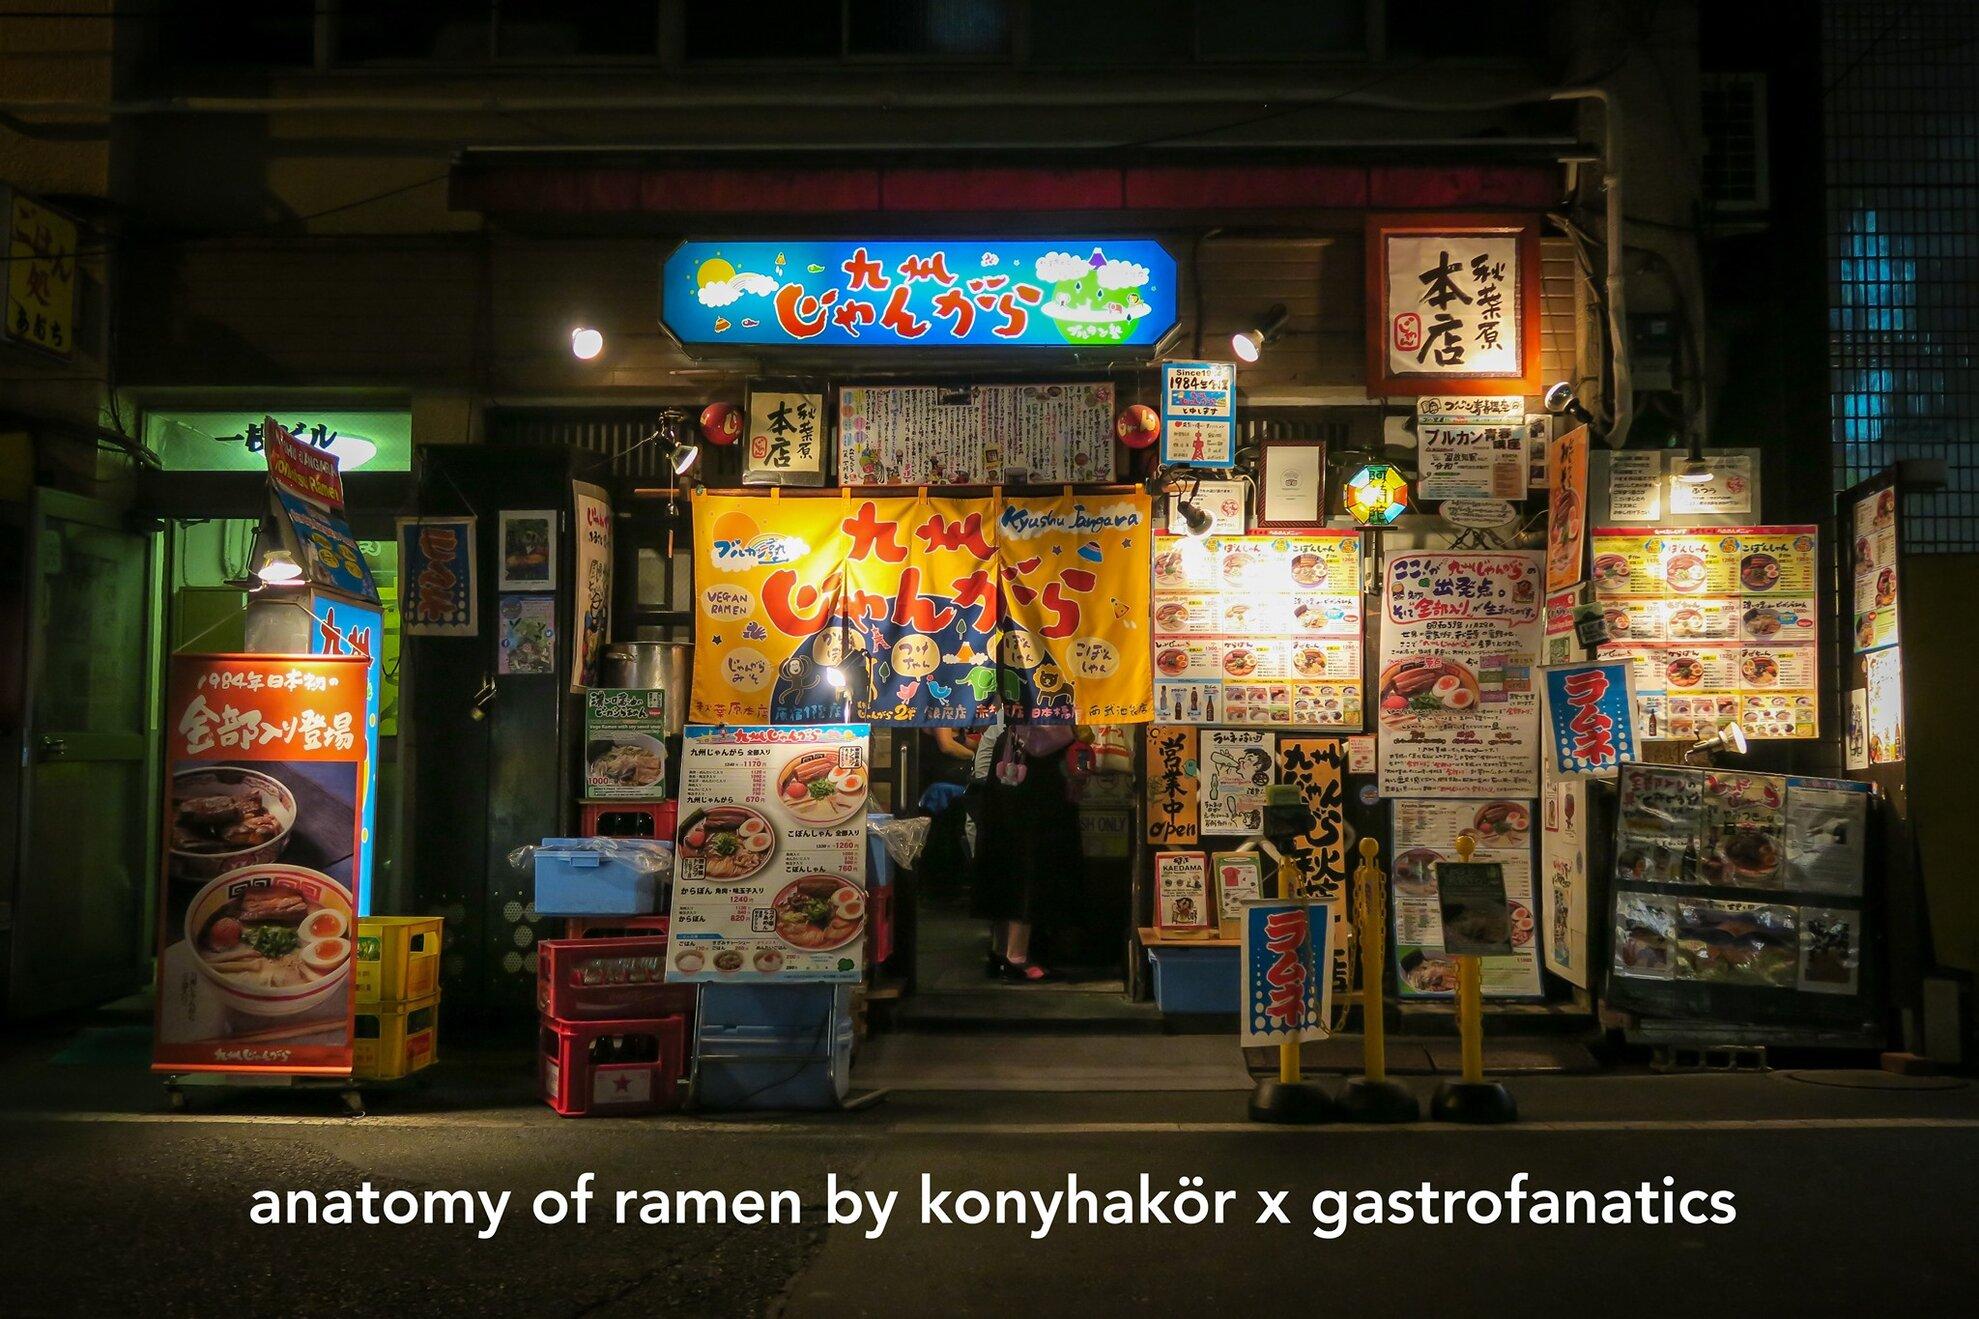 Anatomy of Ramen - Pop-up kitchen by Konyhakör x Gastrofanatics